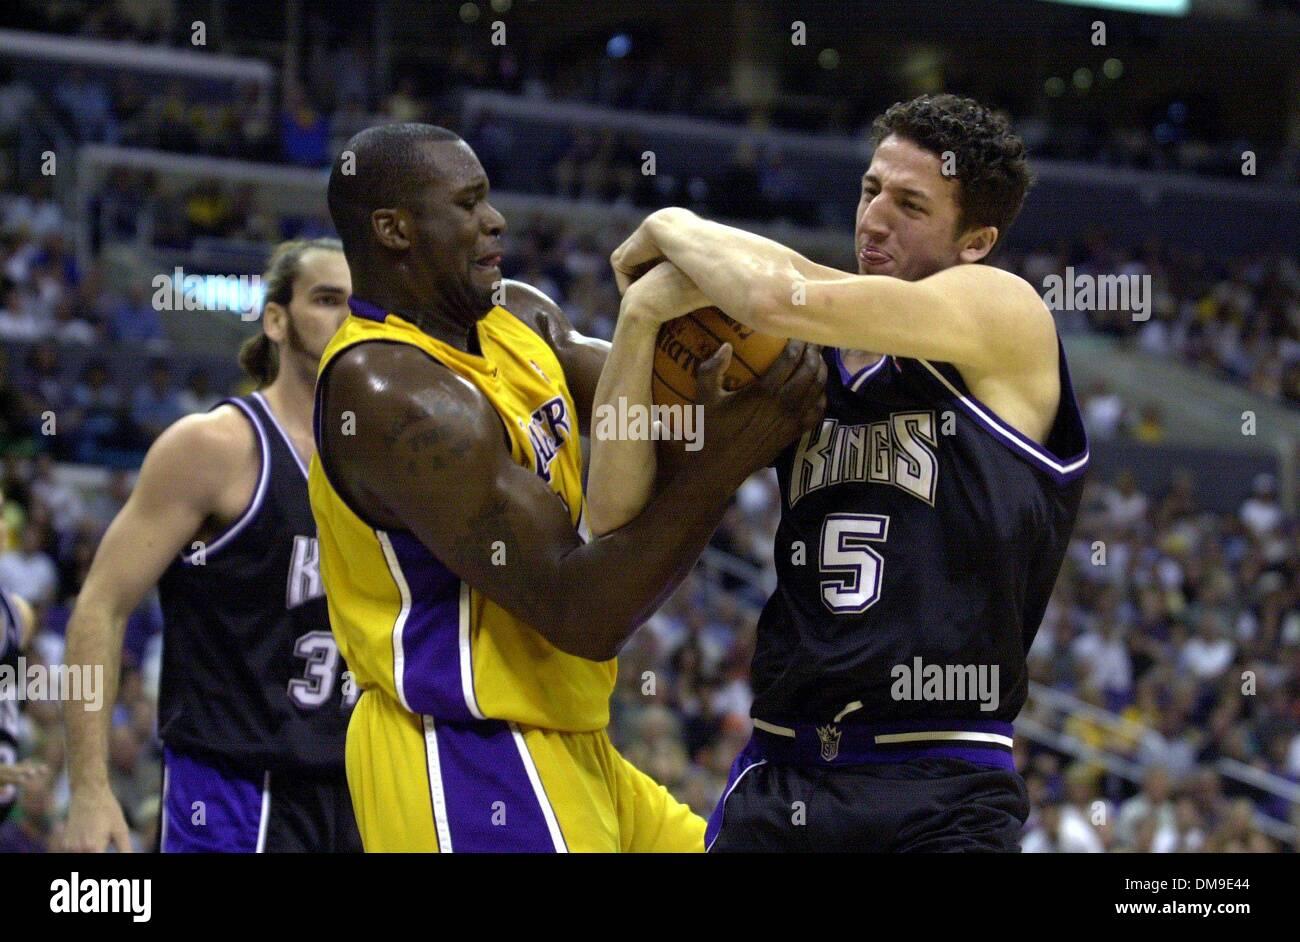 Kings rookie Hedo Turkoglu battles Laker Shaquille O Neal during